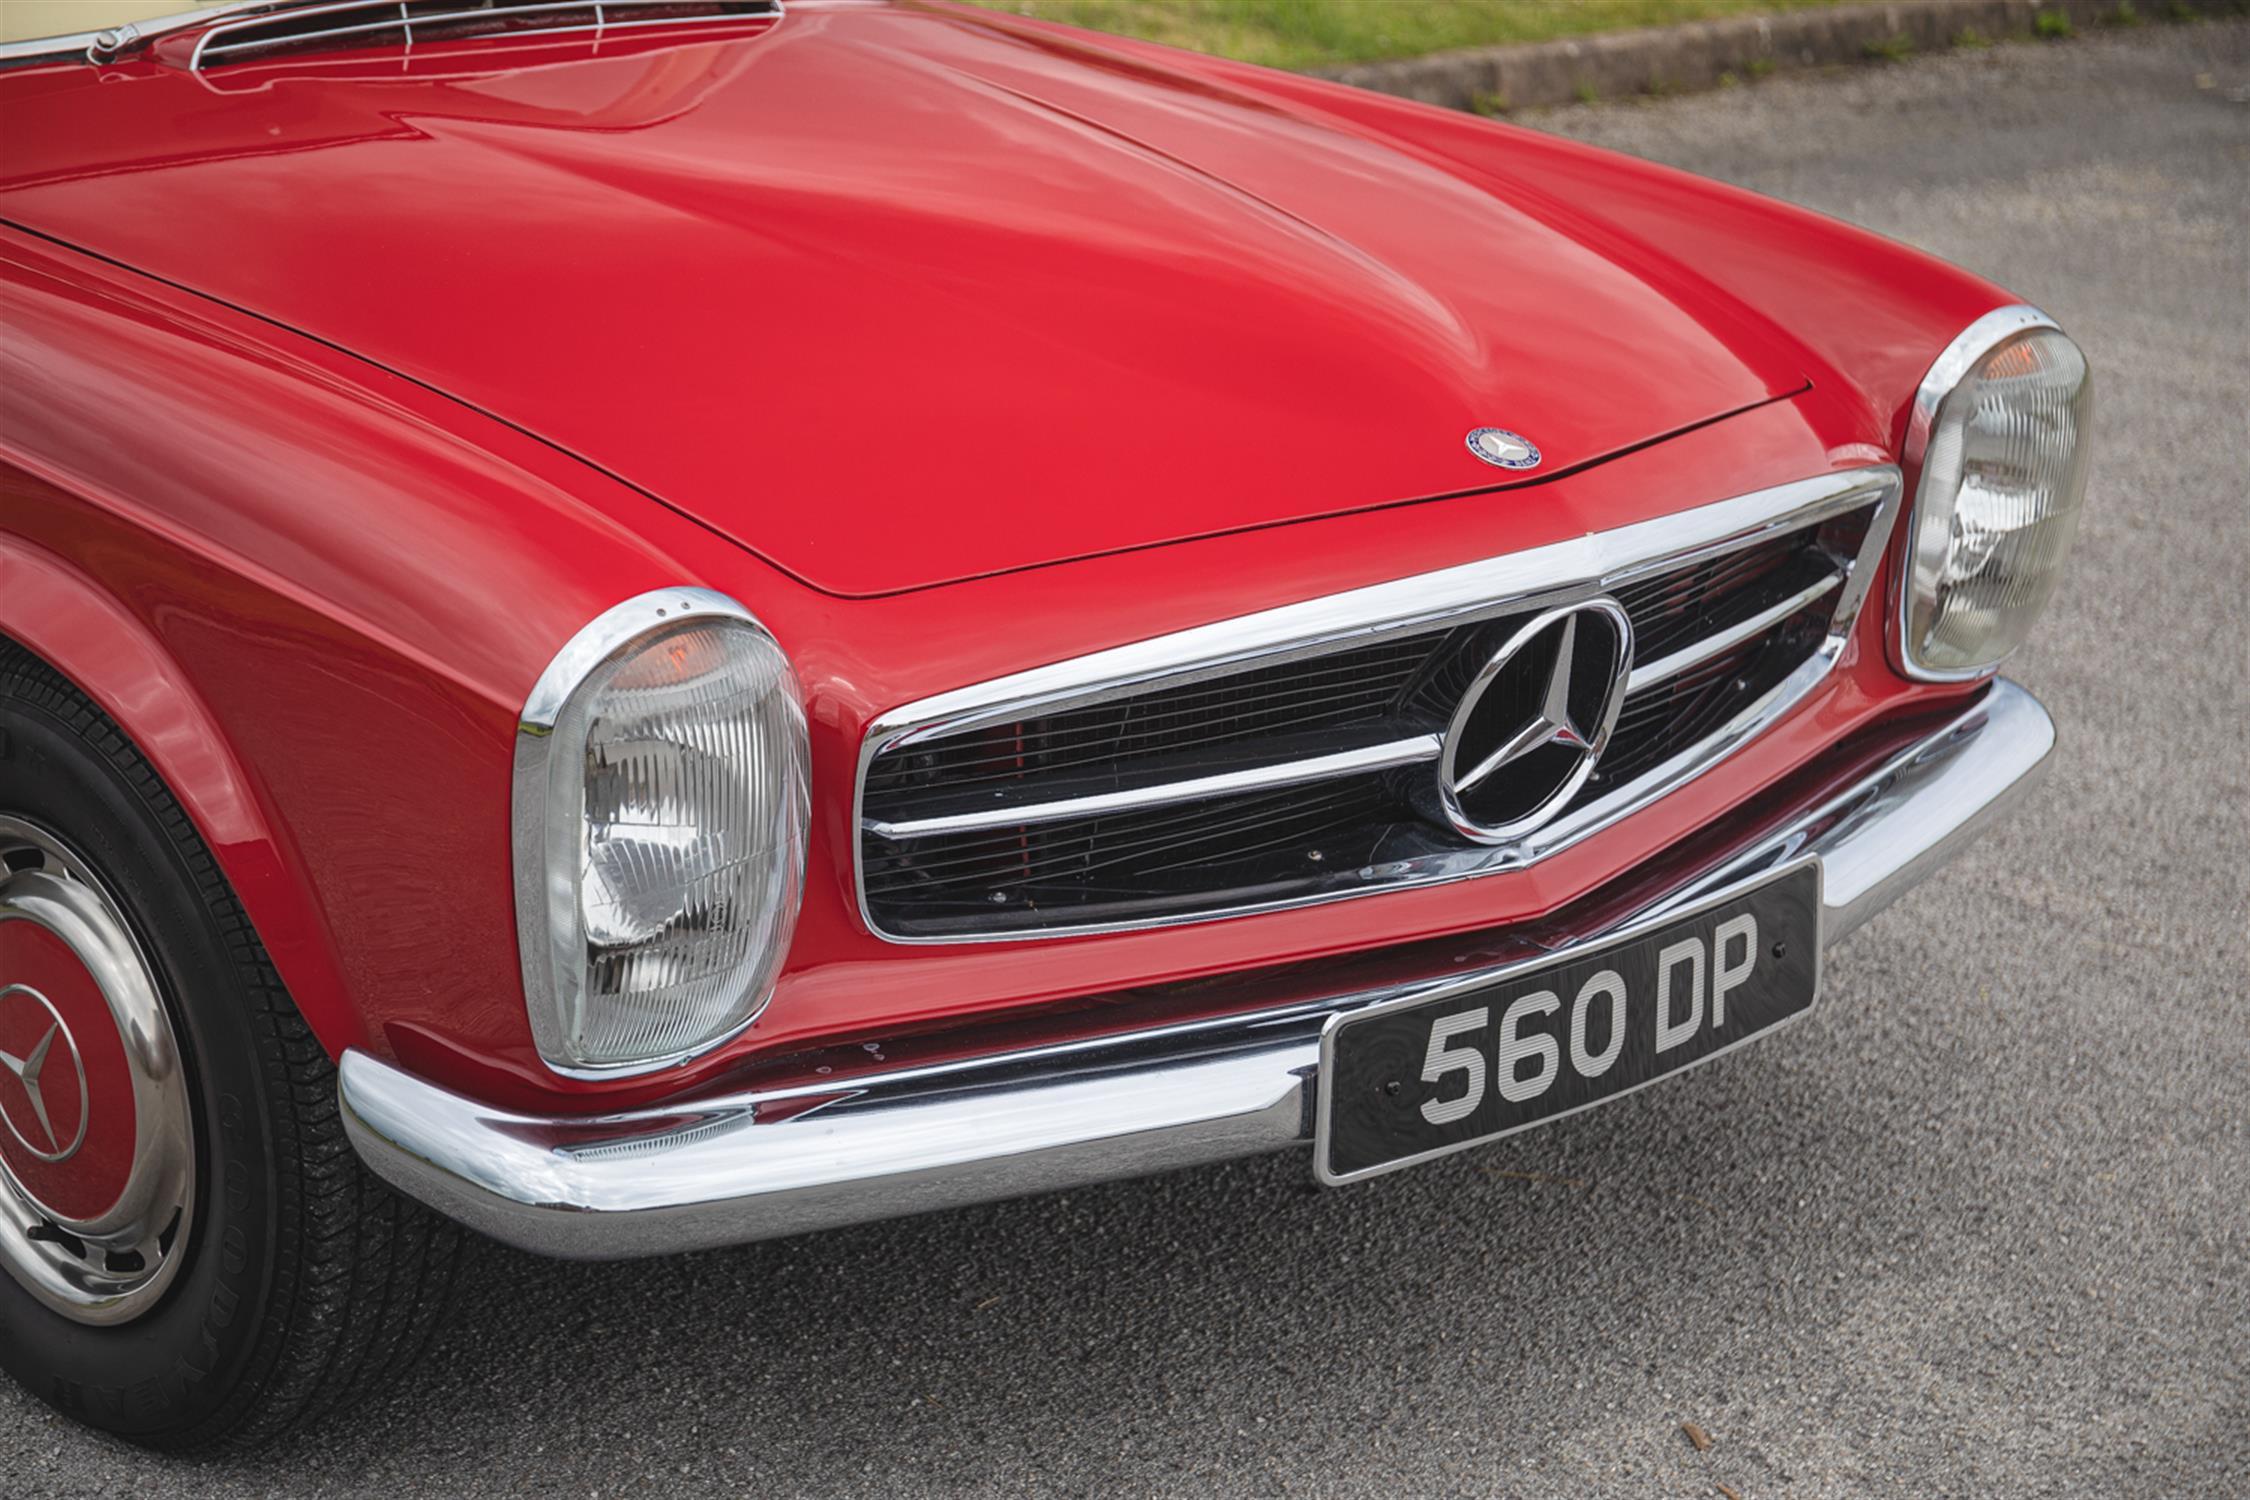 1969 Mercedes-Benz 280SL (W113) - Image 10 of 10